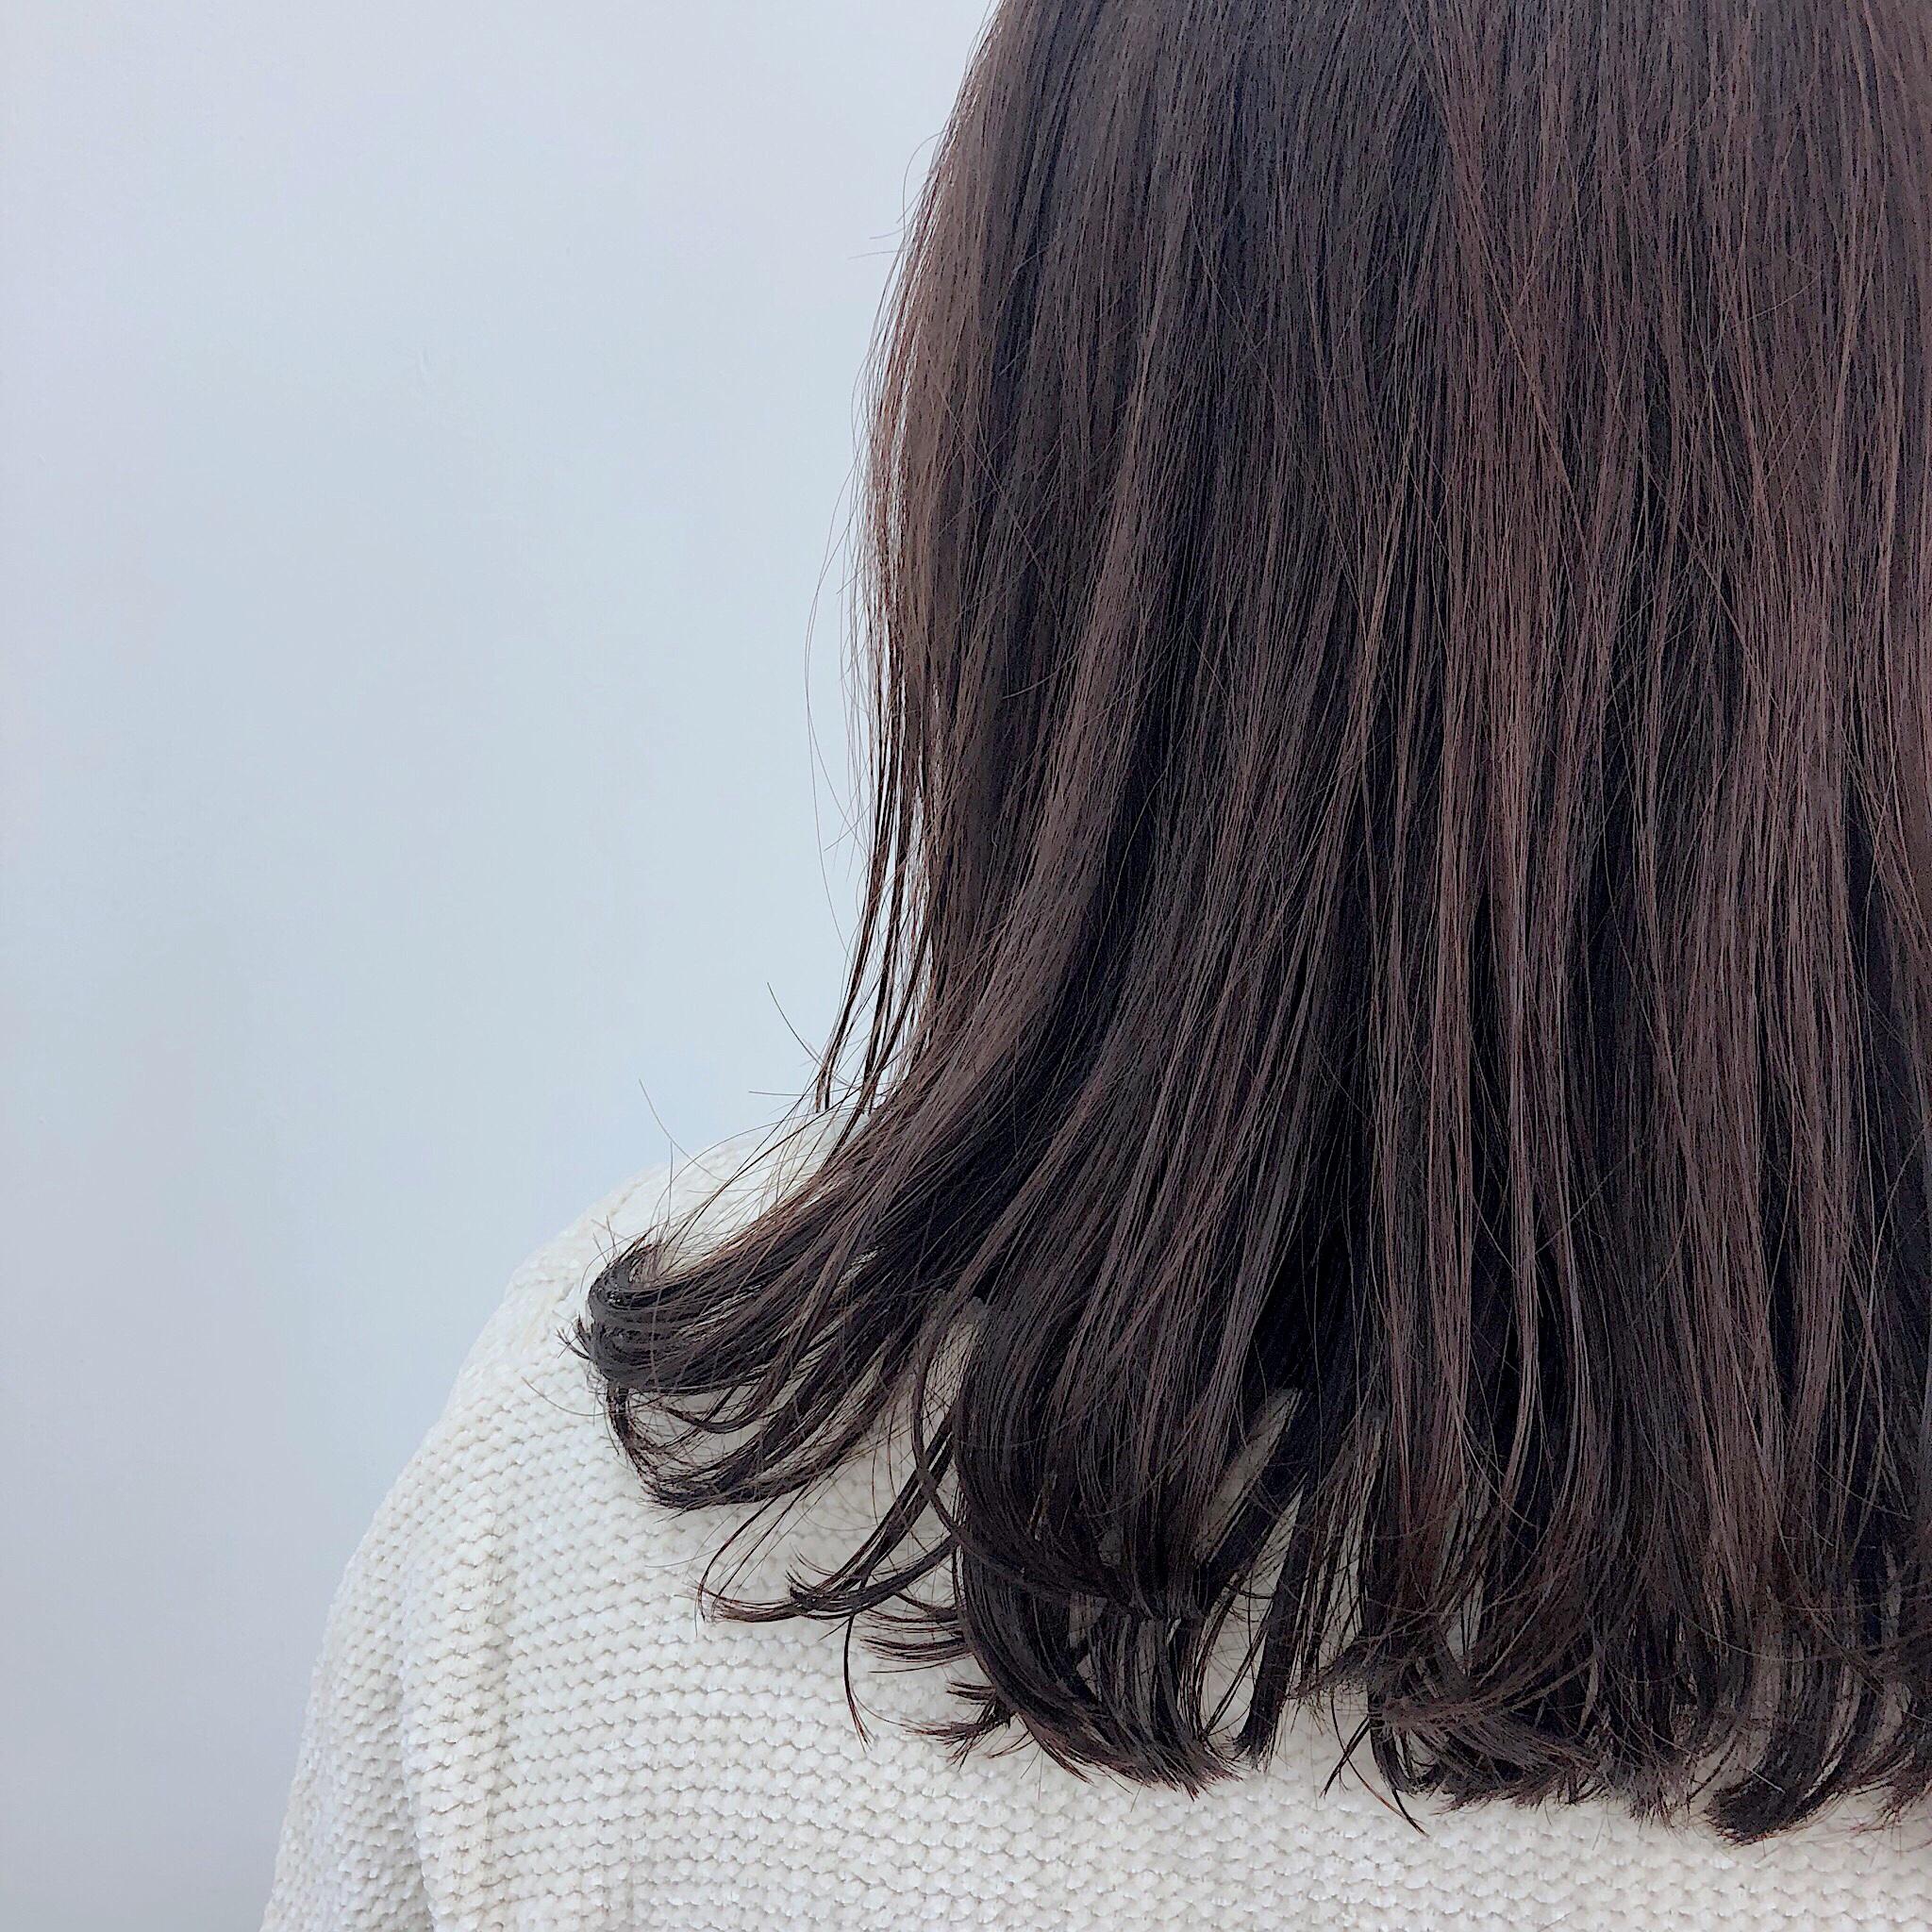 hair care✂︎